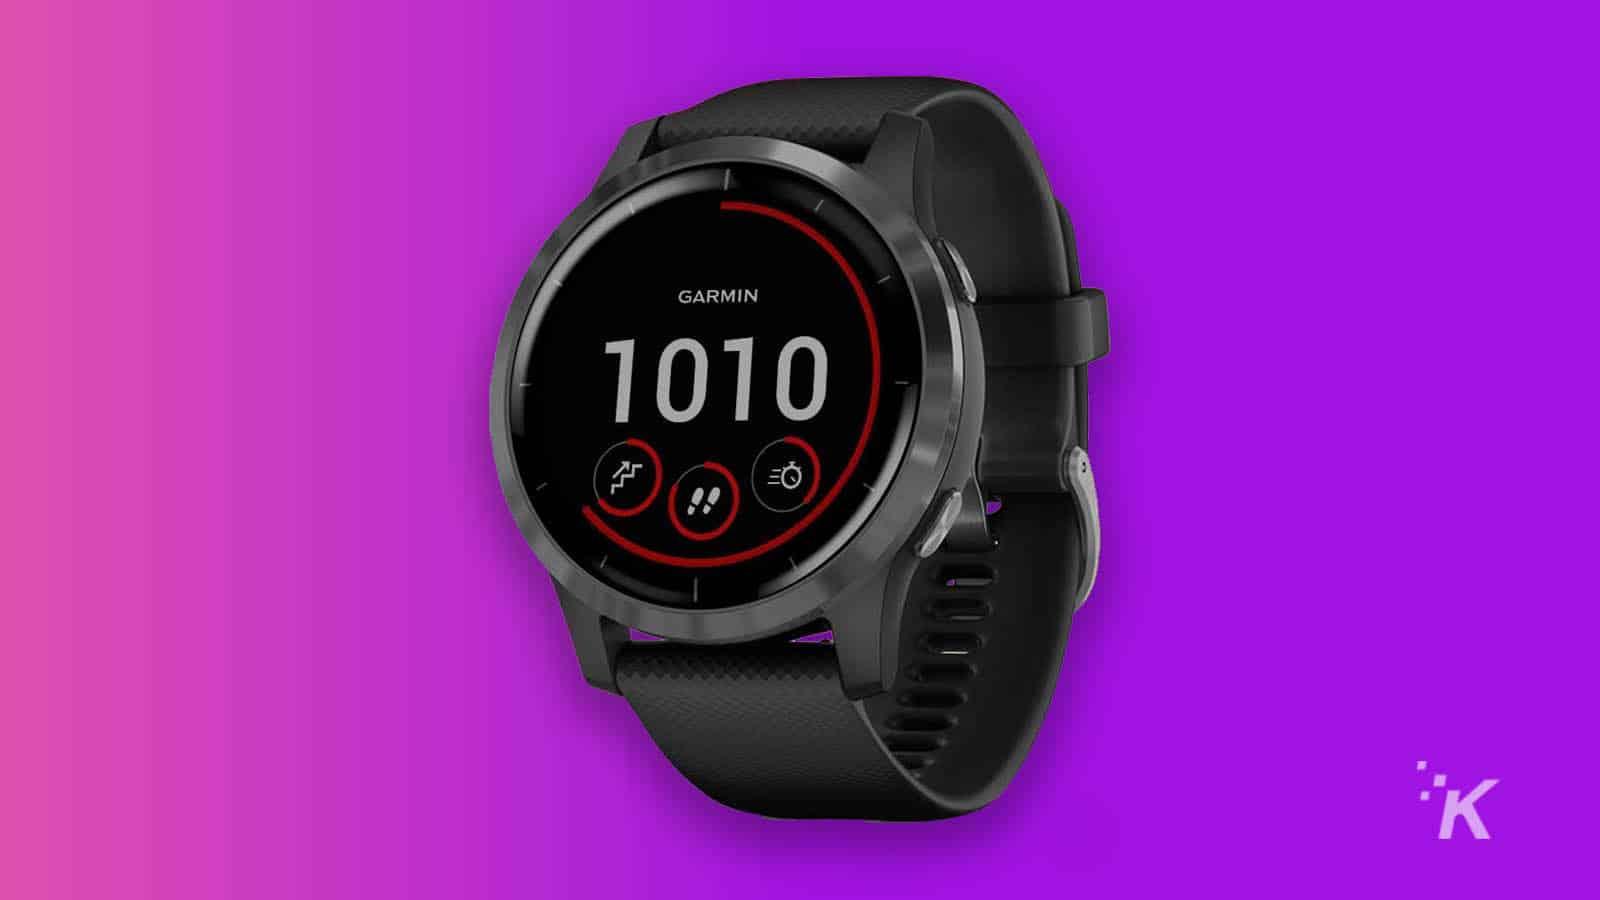 garmin smartwatch on prime day 2021